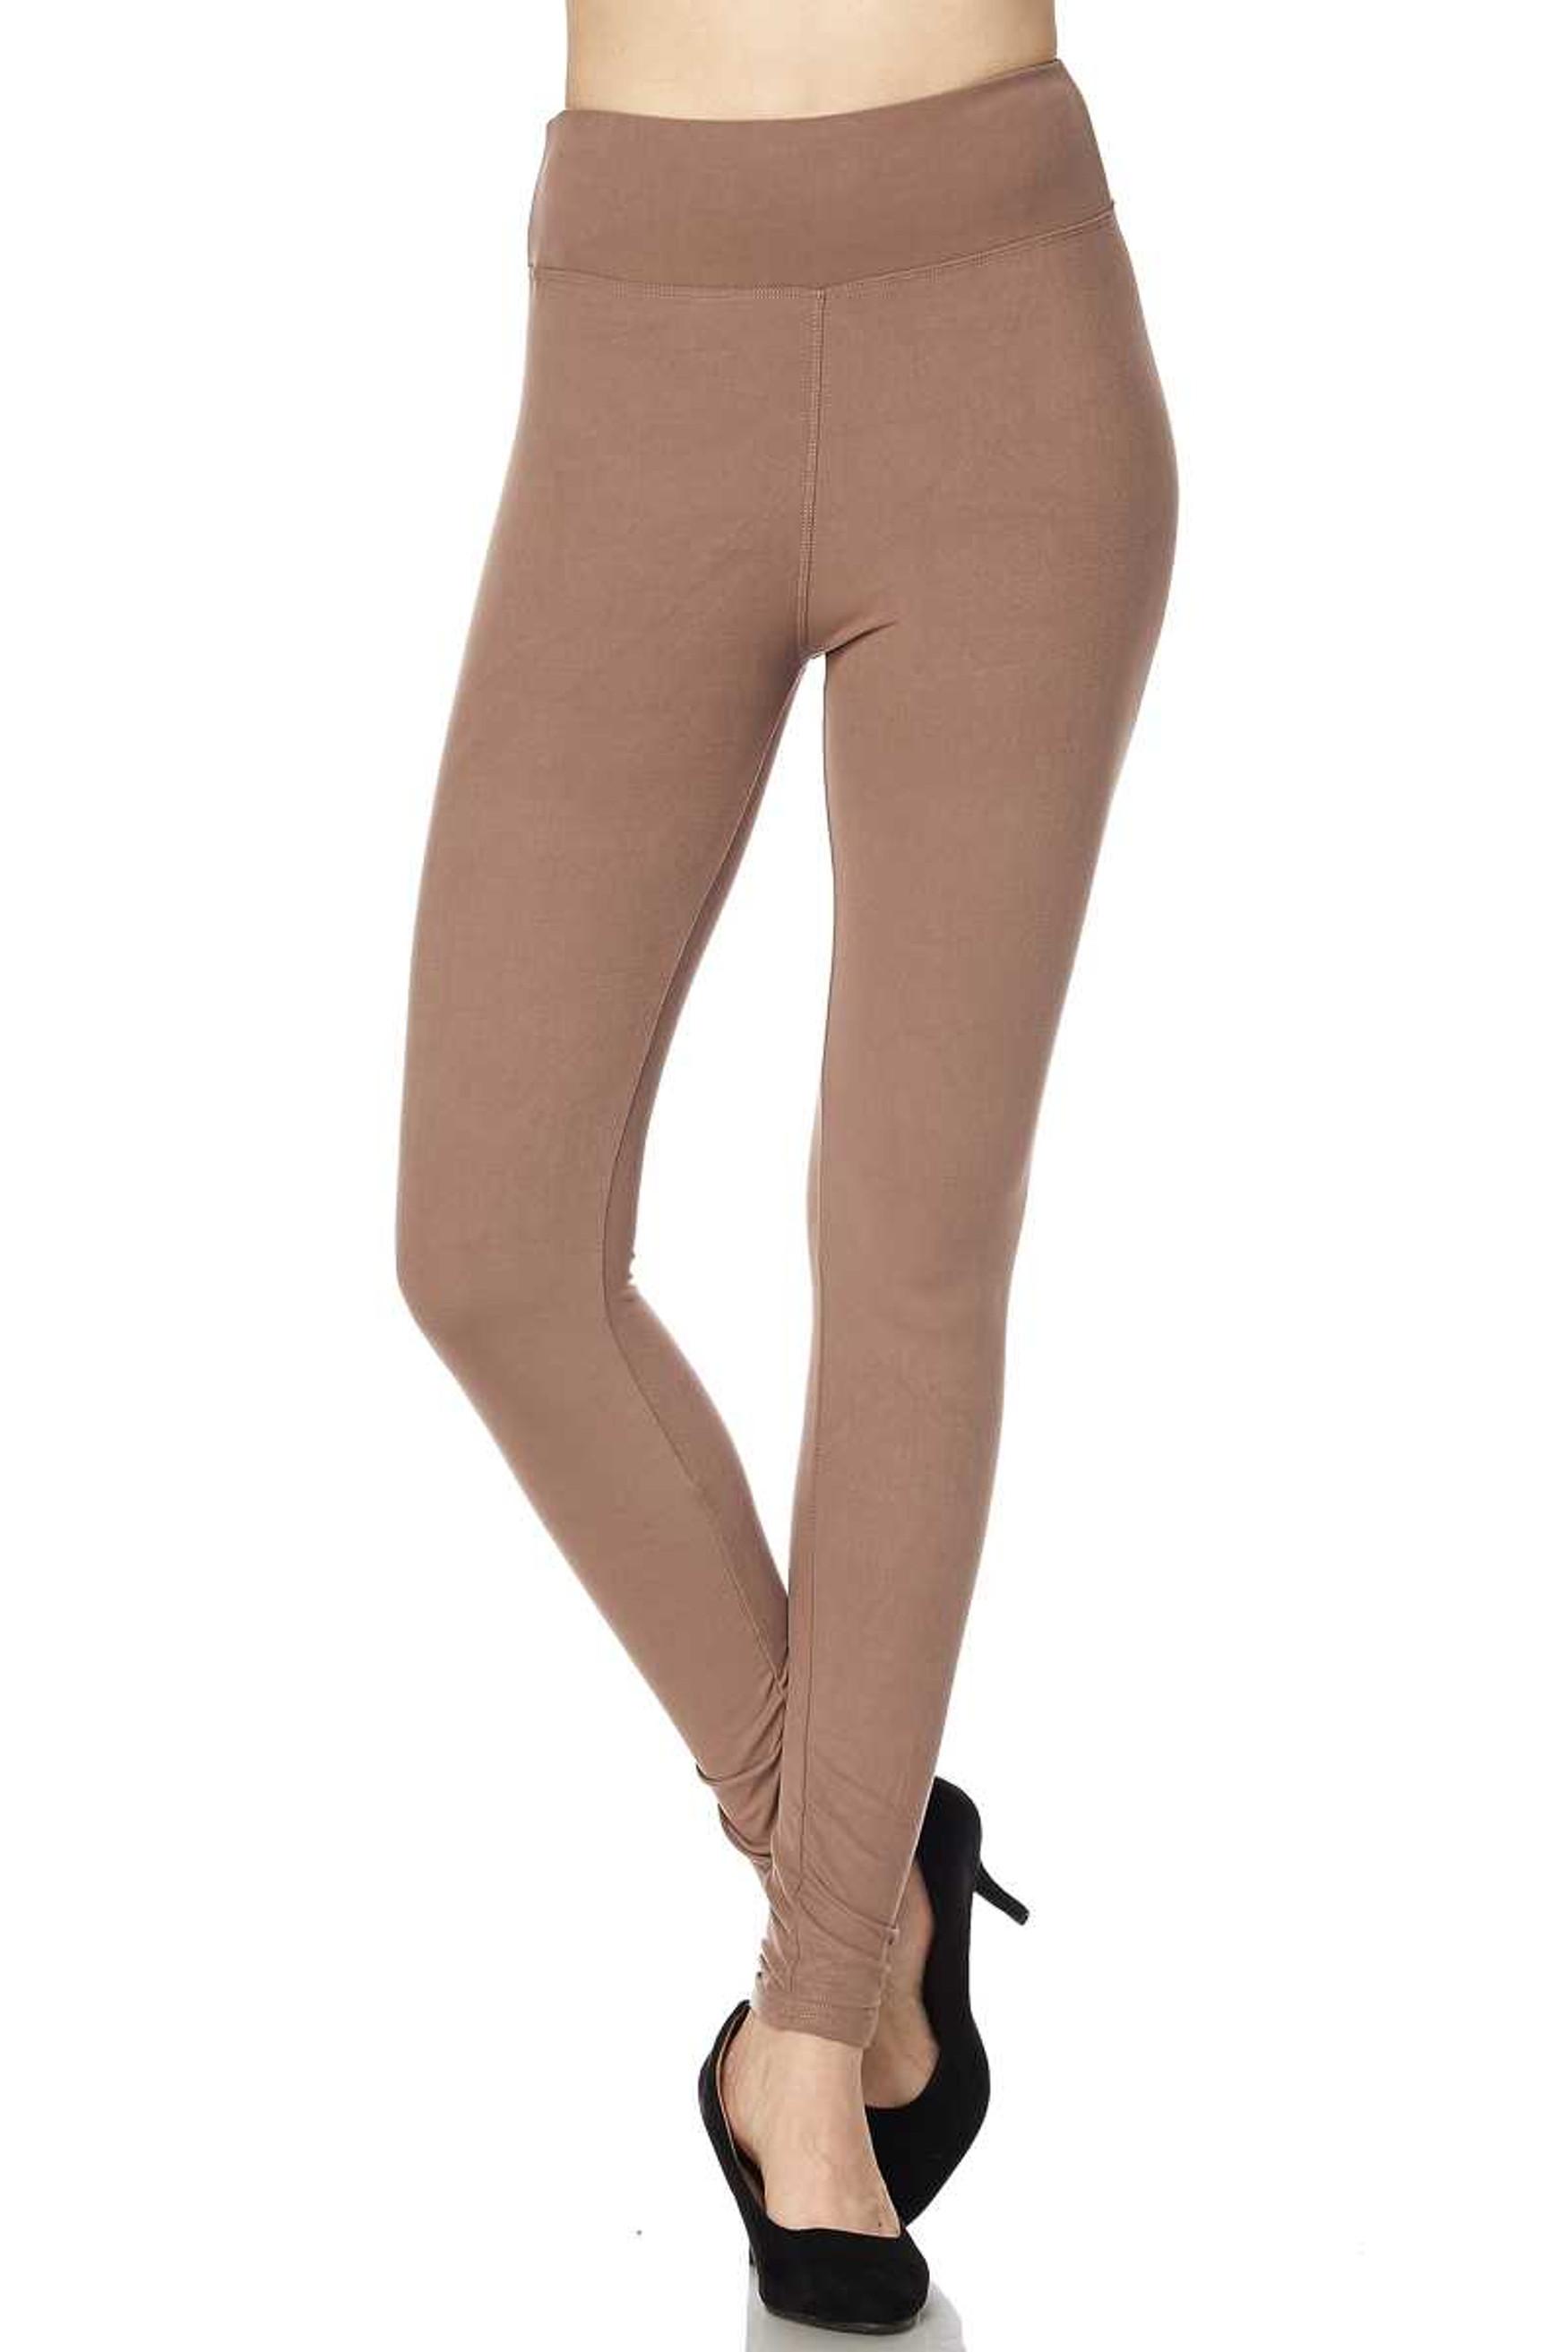 Brushed High Waisted Plus Size Basic Solid Leggings - 3 Inch Band